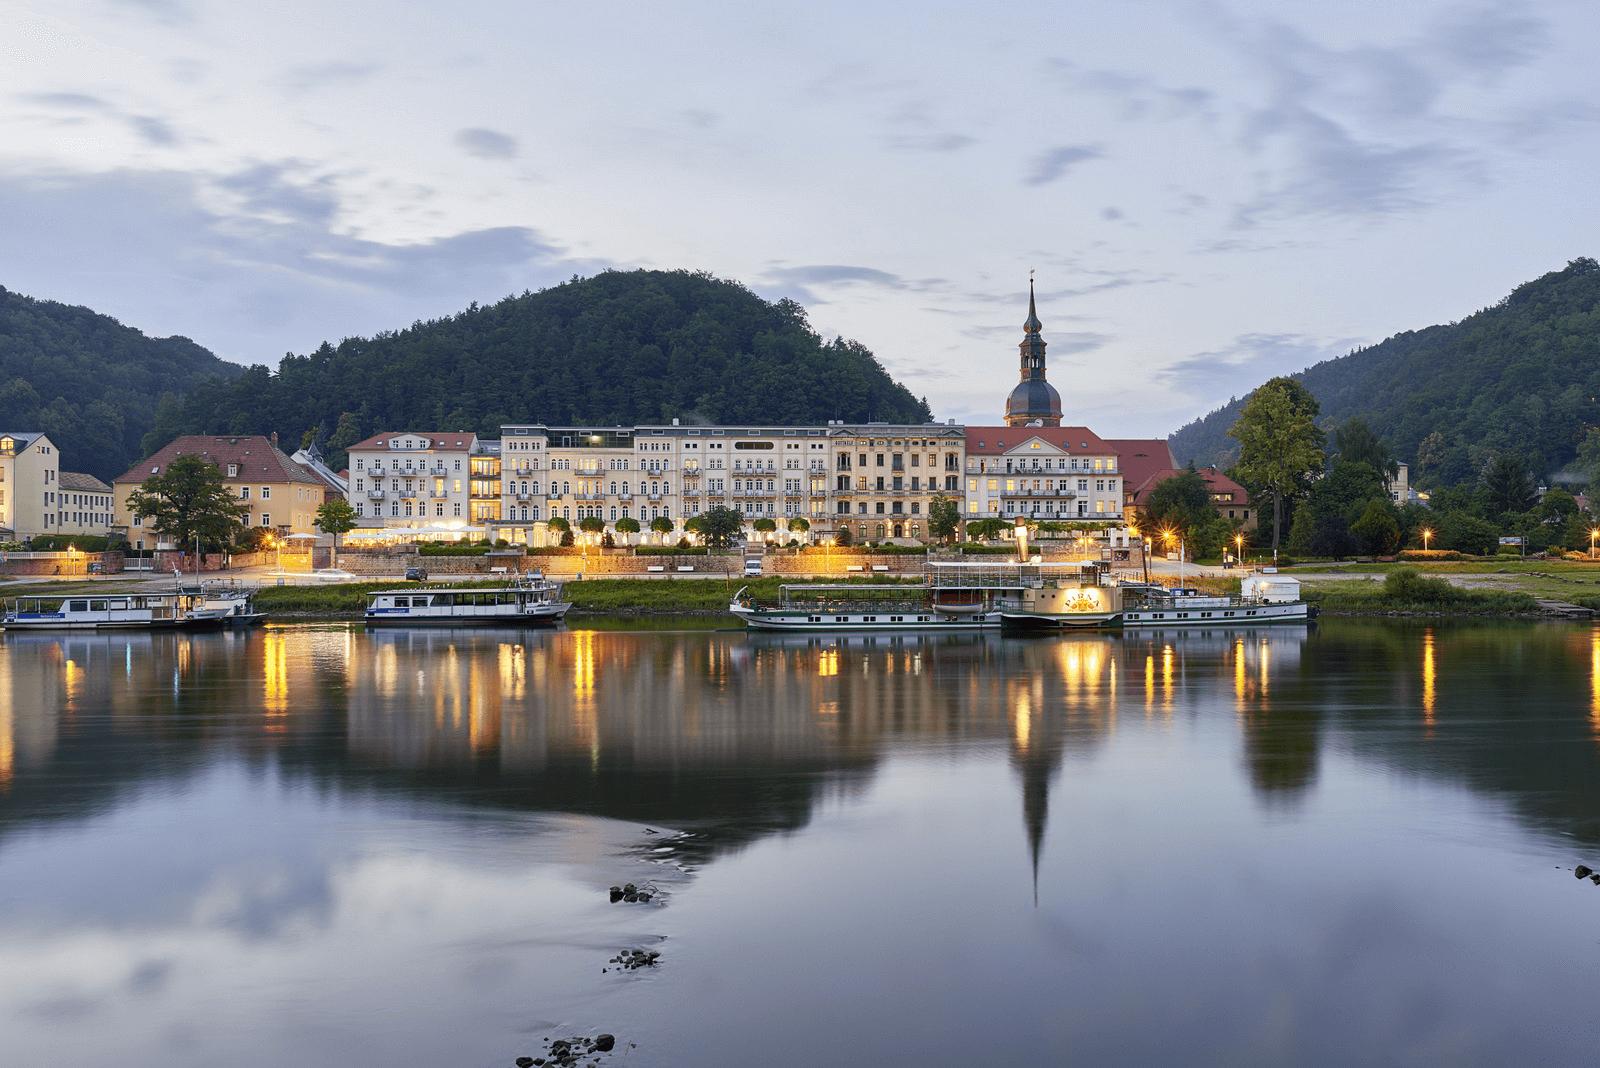 Hotel Toskana Bad Schandau